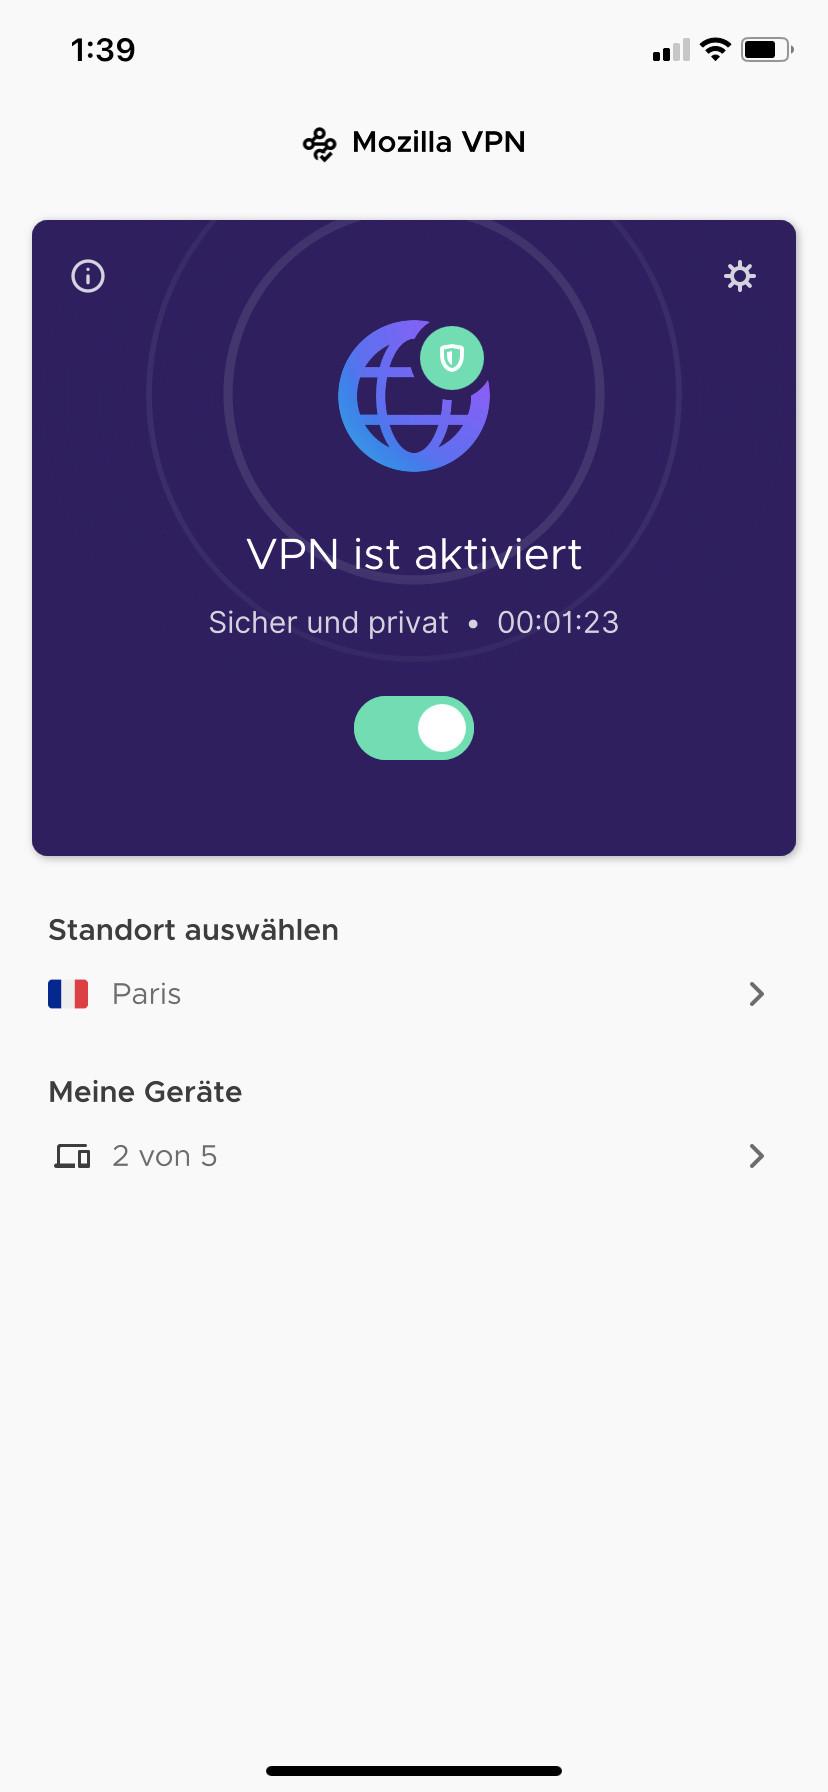 Screenshot 1 - Mozilla VPN (App für iPhone & iPad)